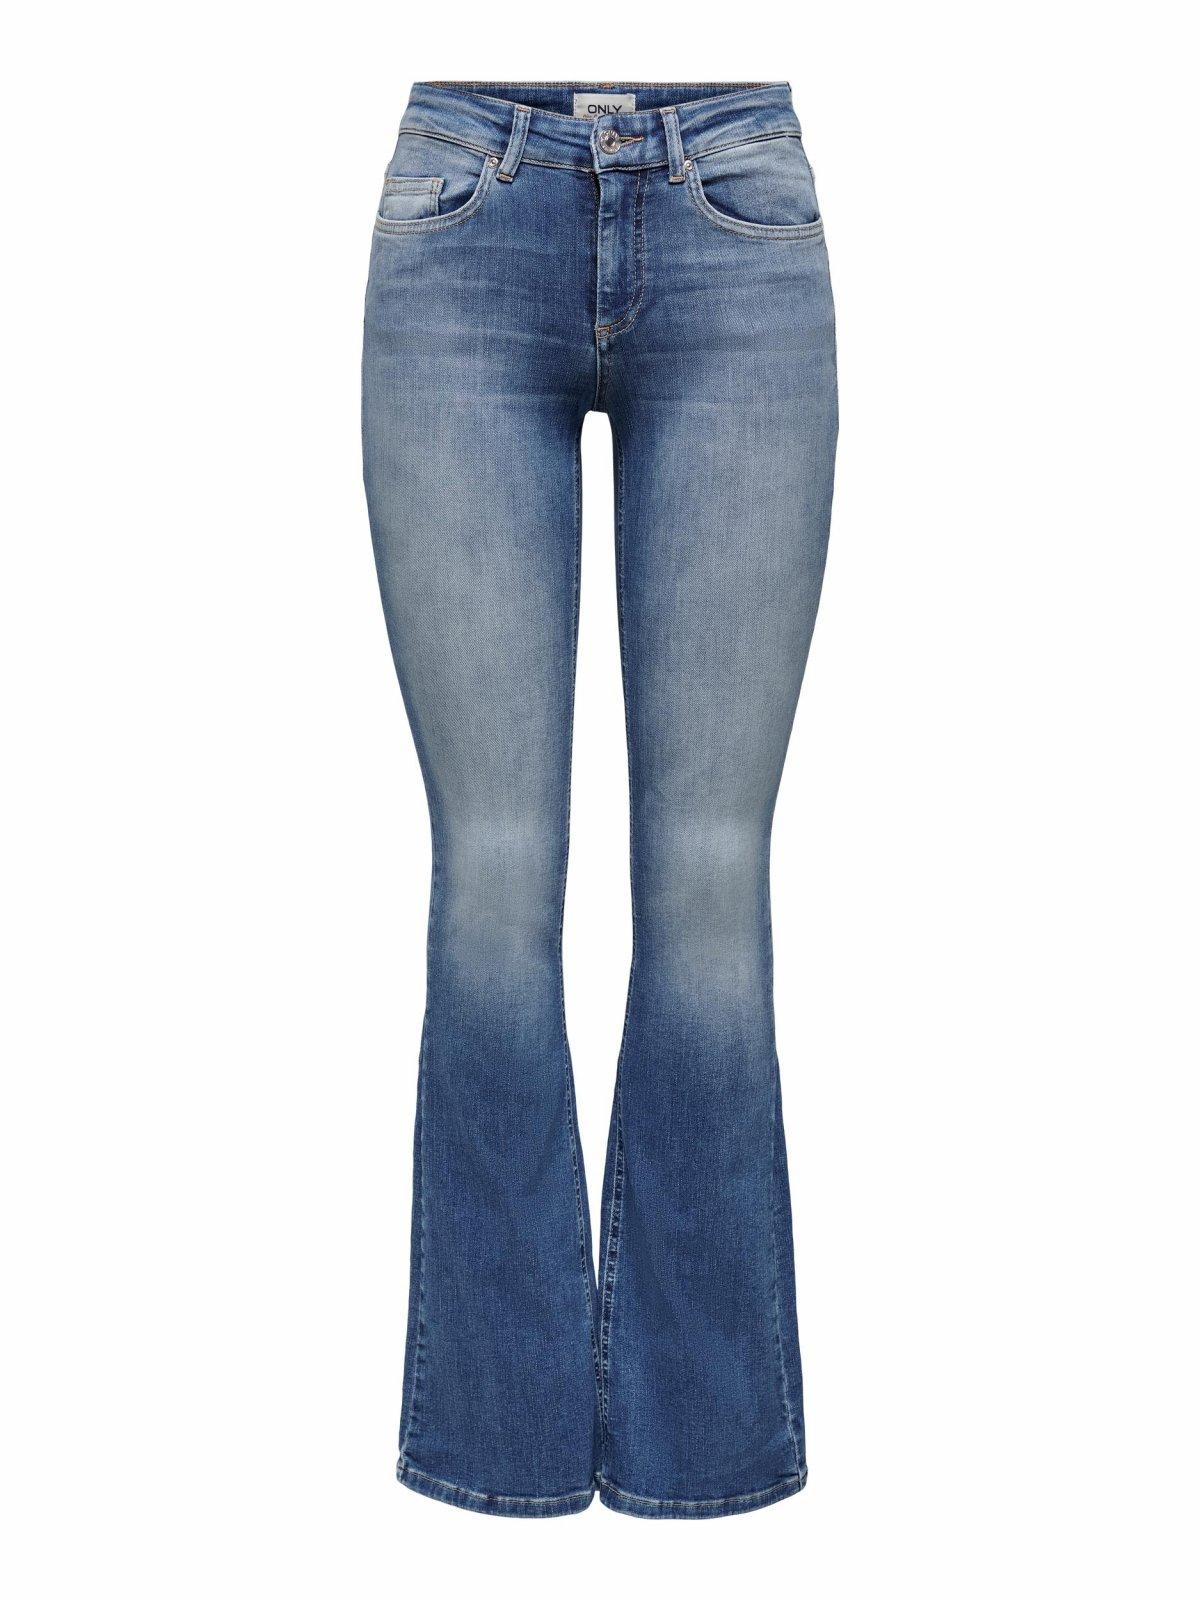 https://resim.oddamoda.com/15223514/mediumblu/onlblush-bol-paca-jeans-15223514-012ebd23ecce.jpg